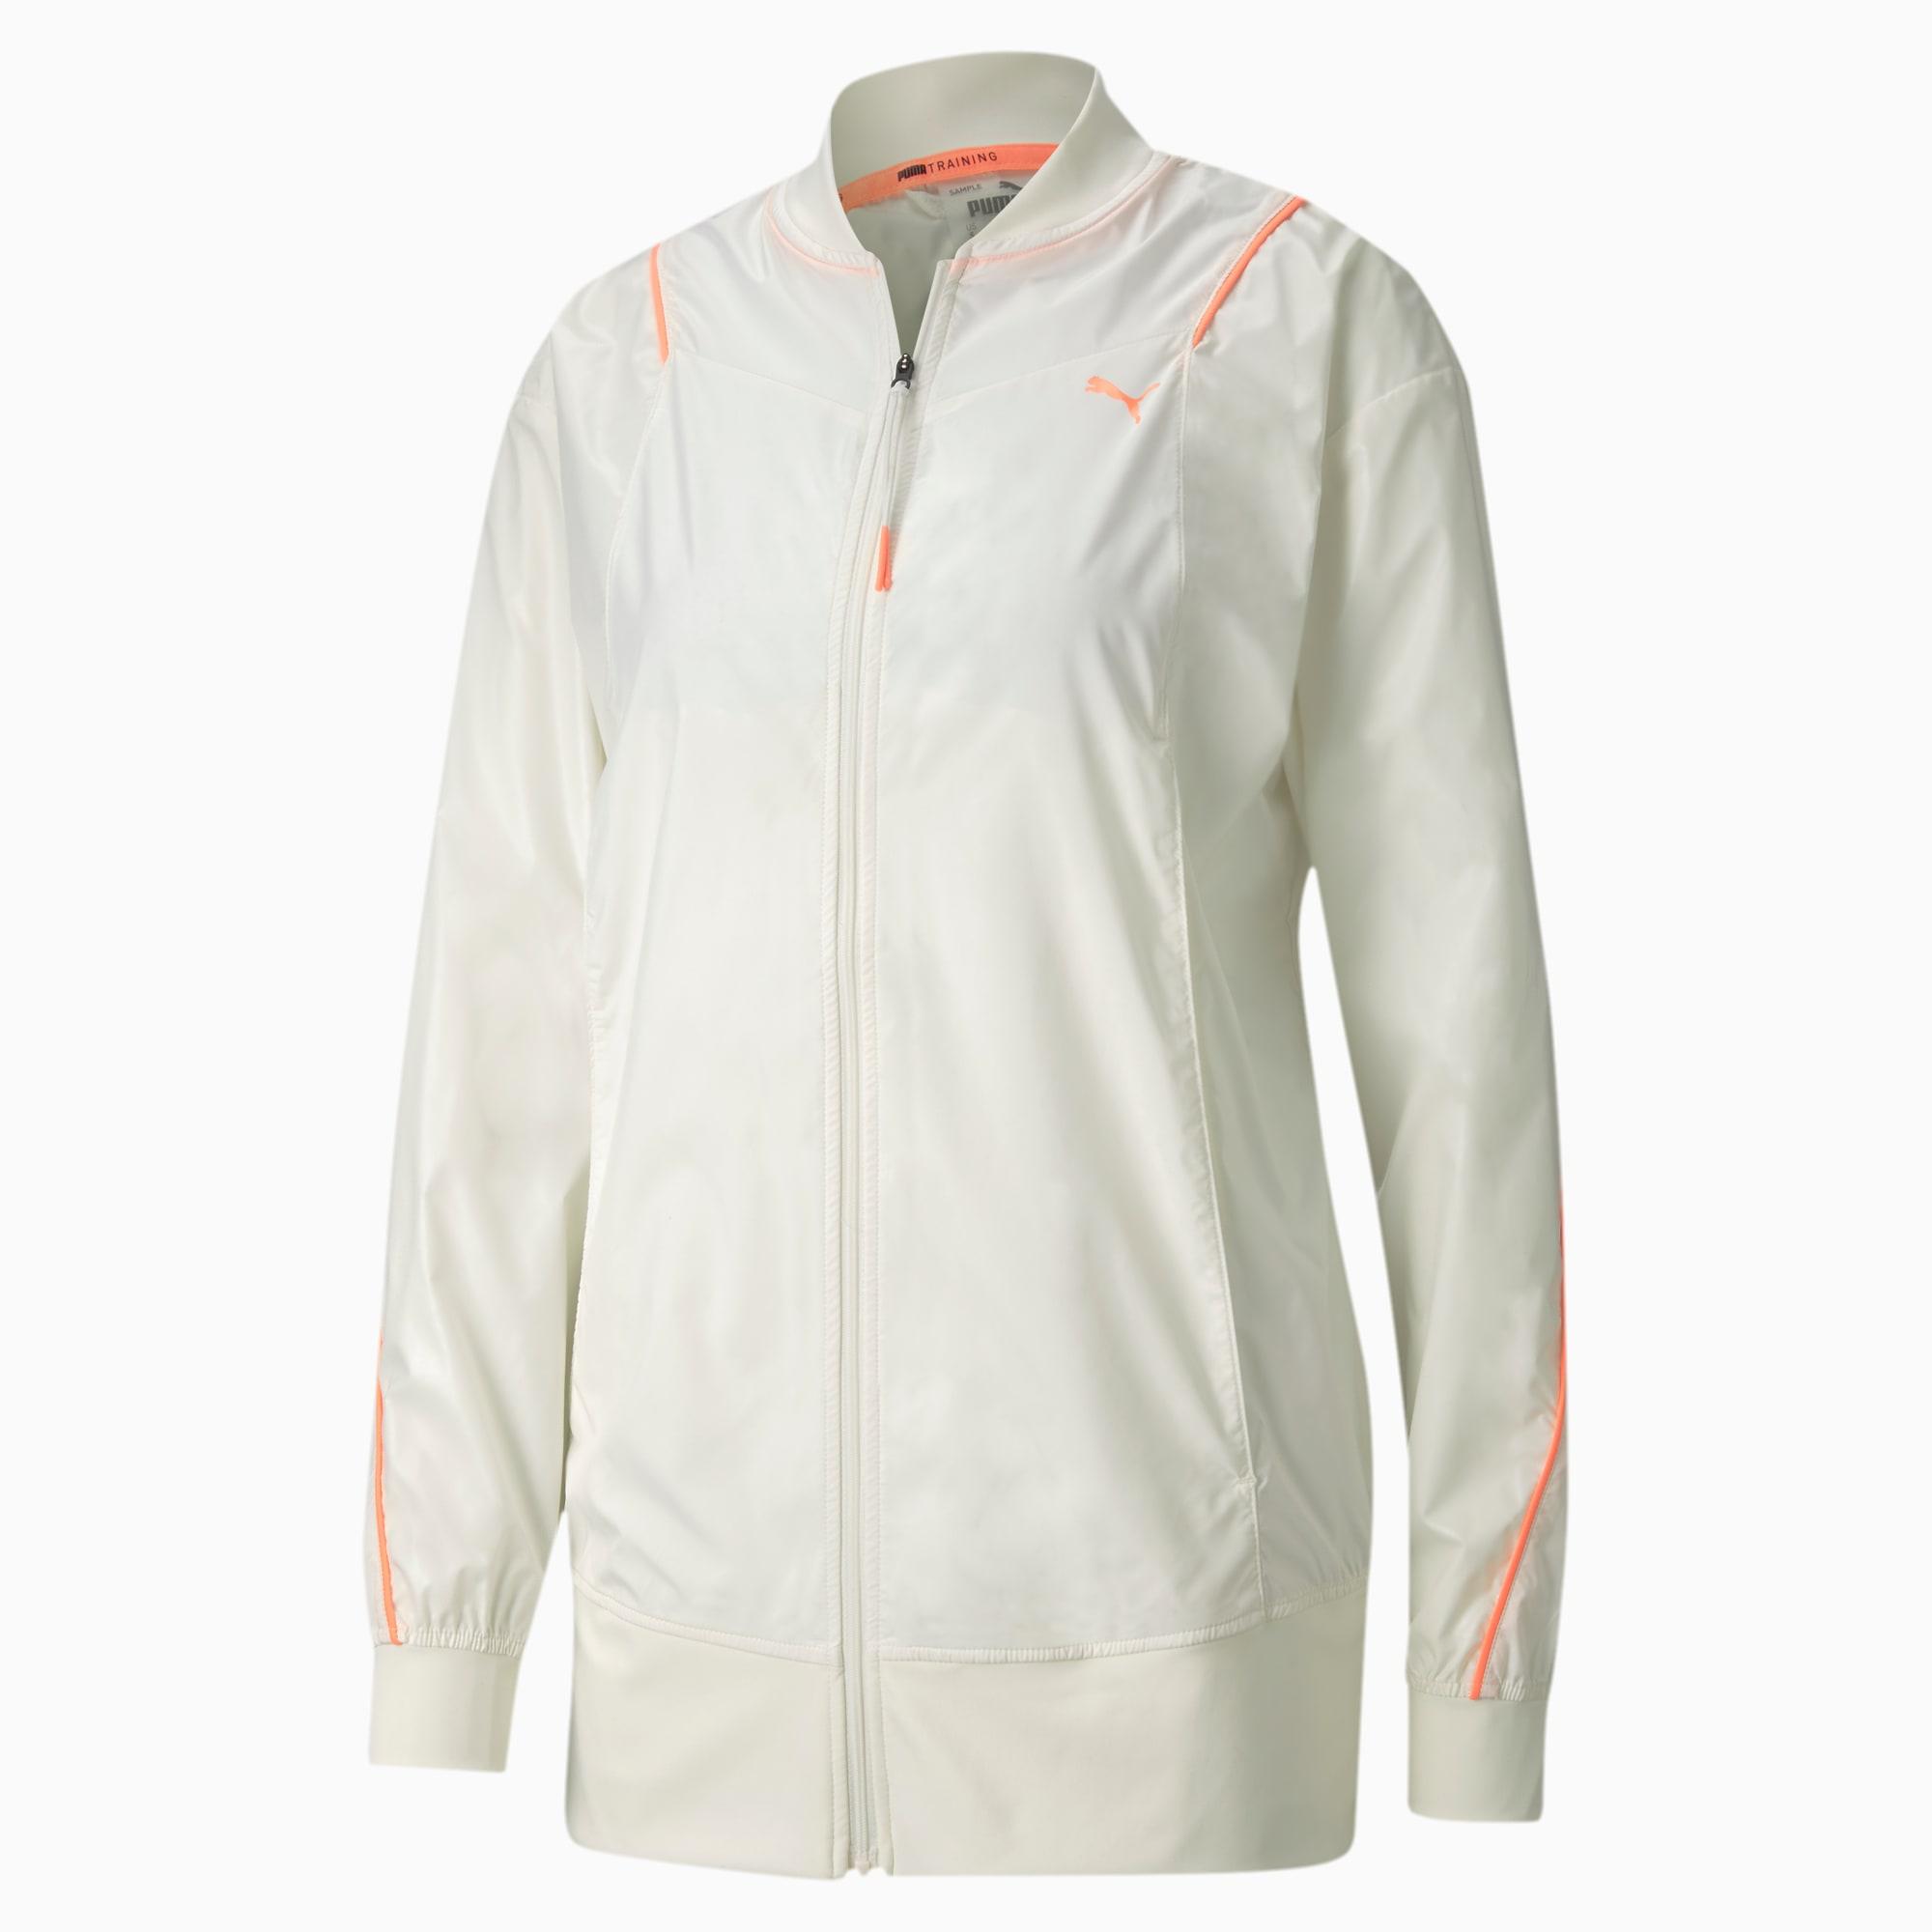 puma -  Pearl Gewebte Damen Trainingsjacke | Mit Aucun | Weiß | Größe: XS